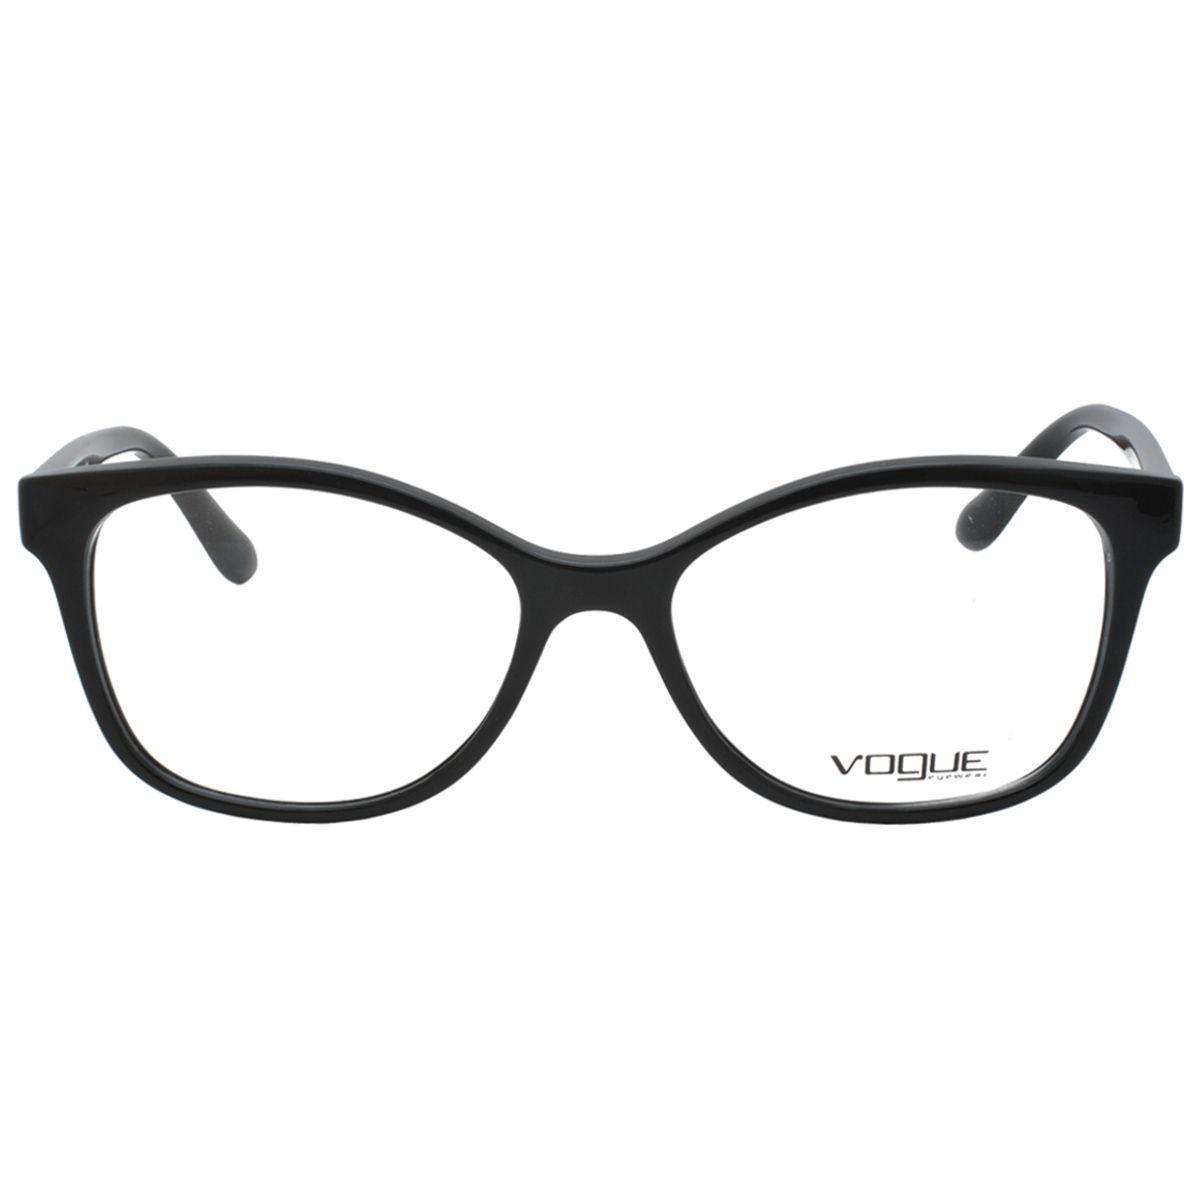 6b069d7b7718d Óculos de Grau Vogue Feminino VO5233L W44 - Acetato Preto - Óptica ...